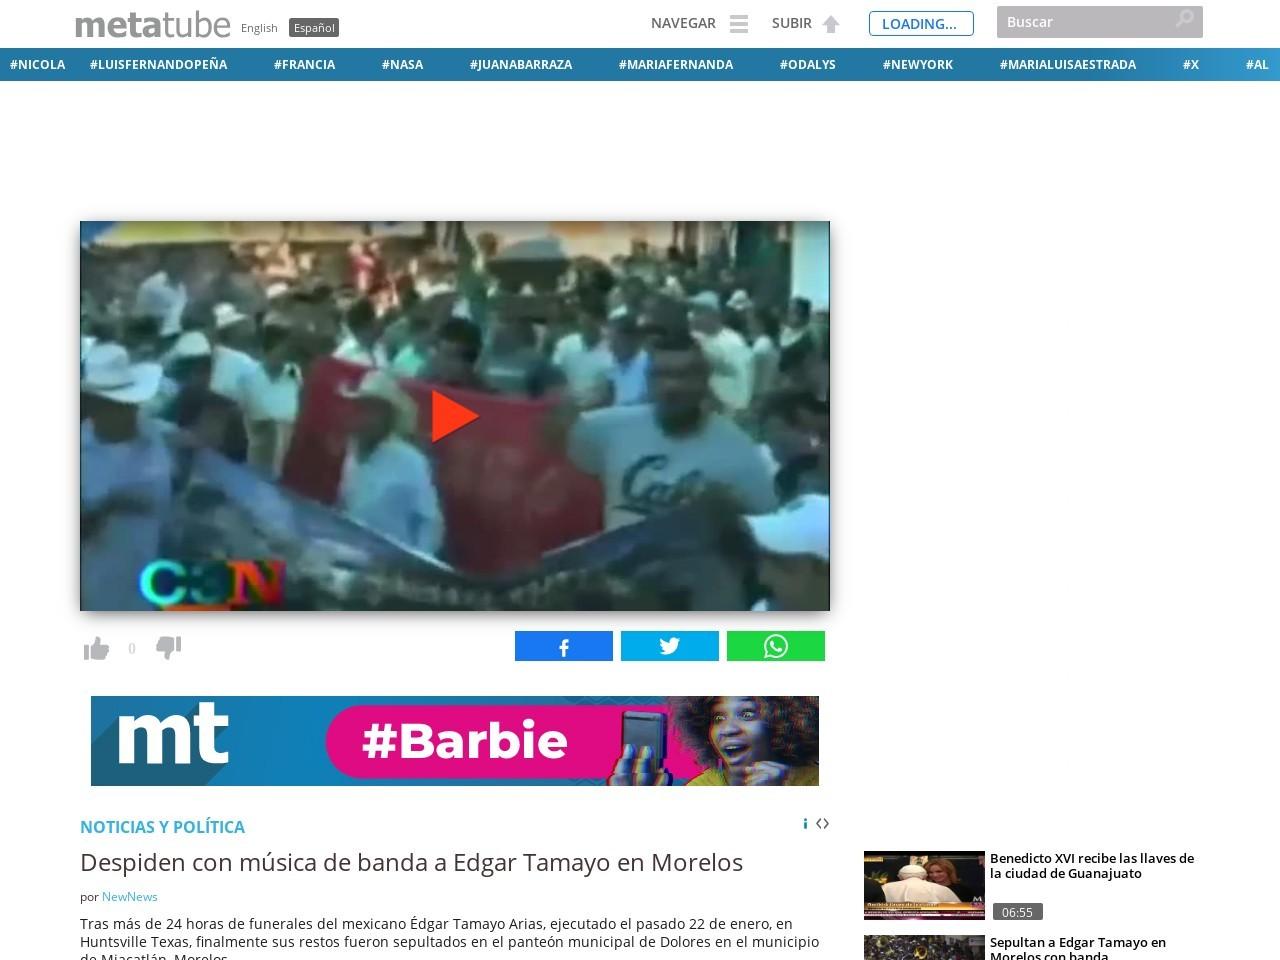 Despiden con música de banda a Edgar Tamayo en Morelos …